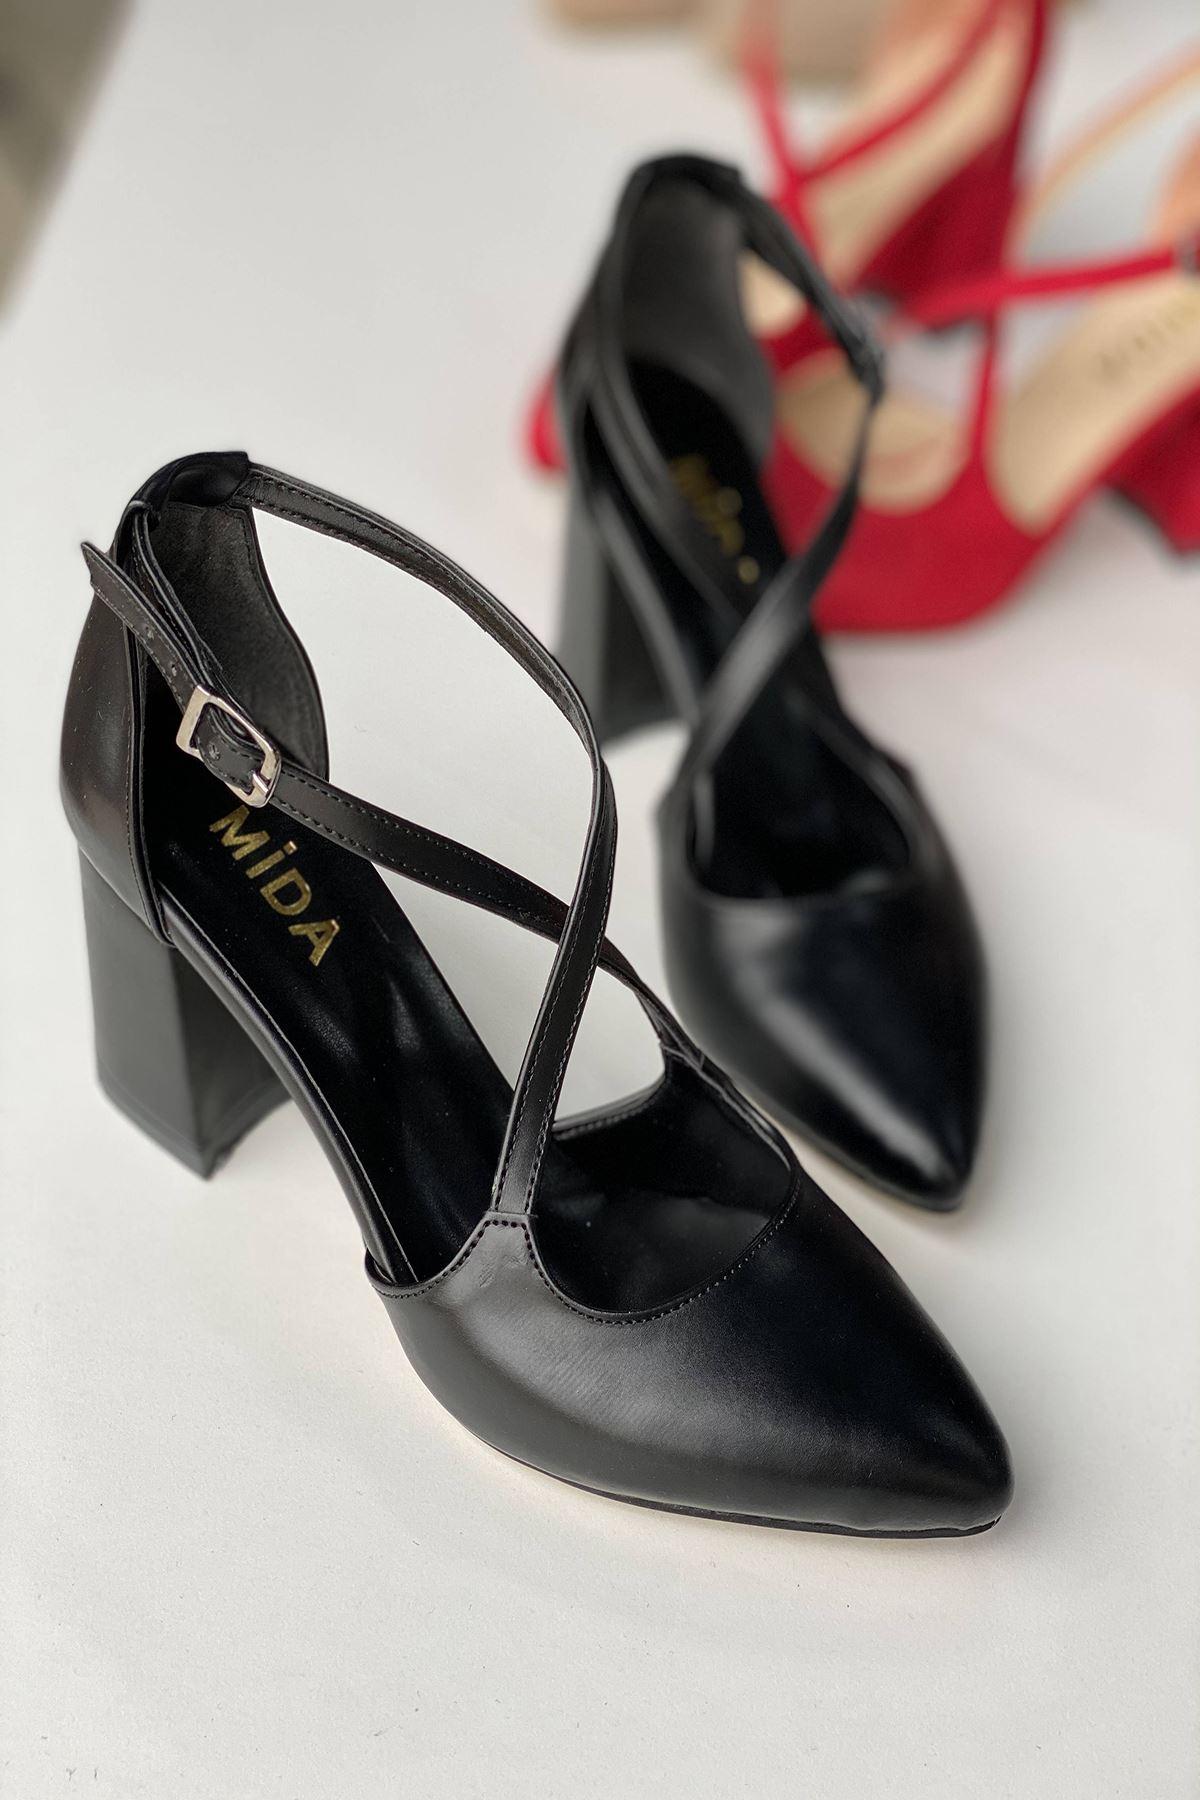 Y113 Siyah Deri Topuklu Ayakkabı